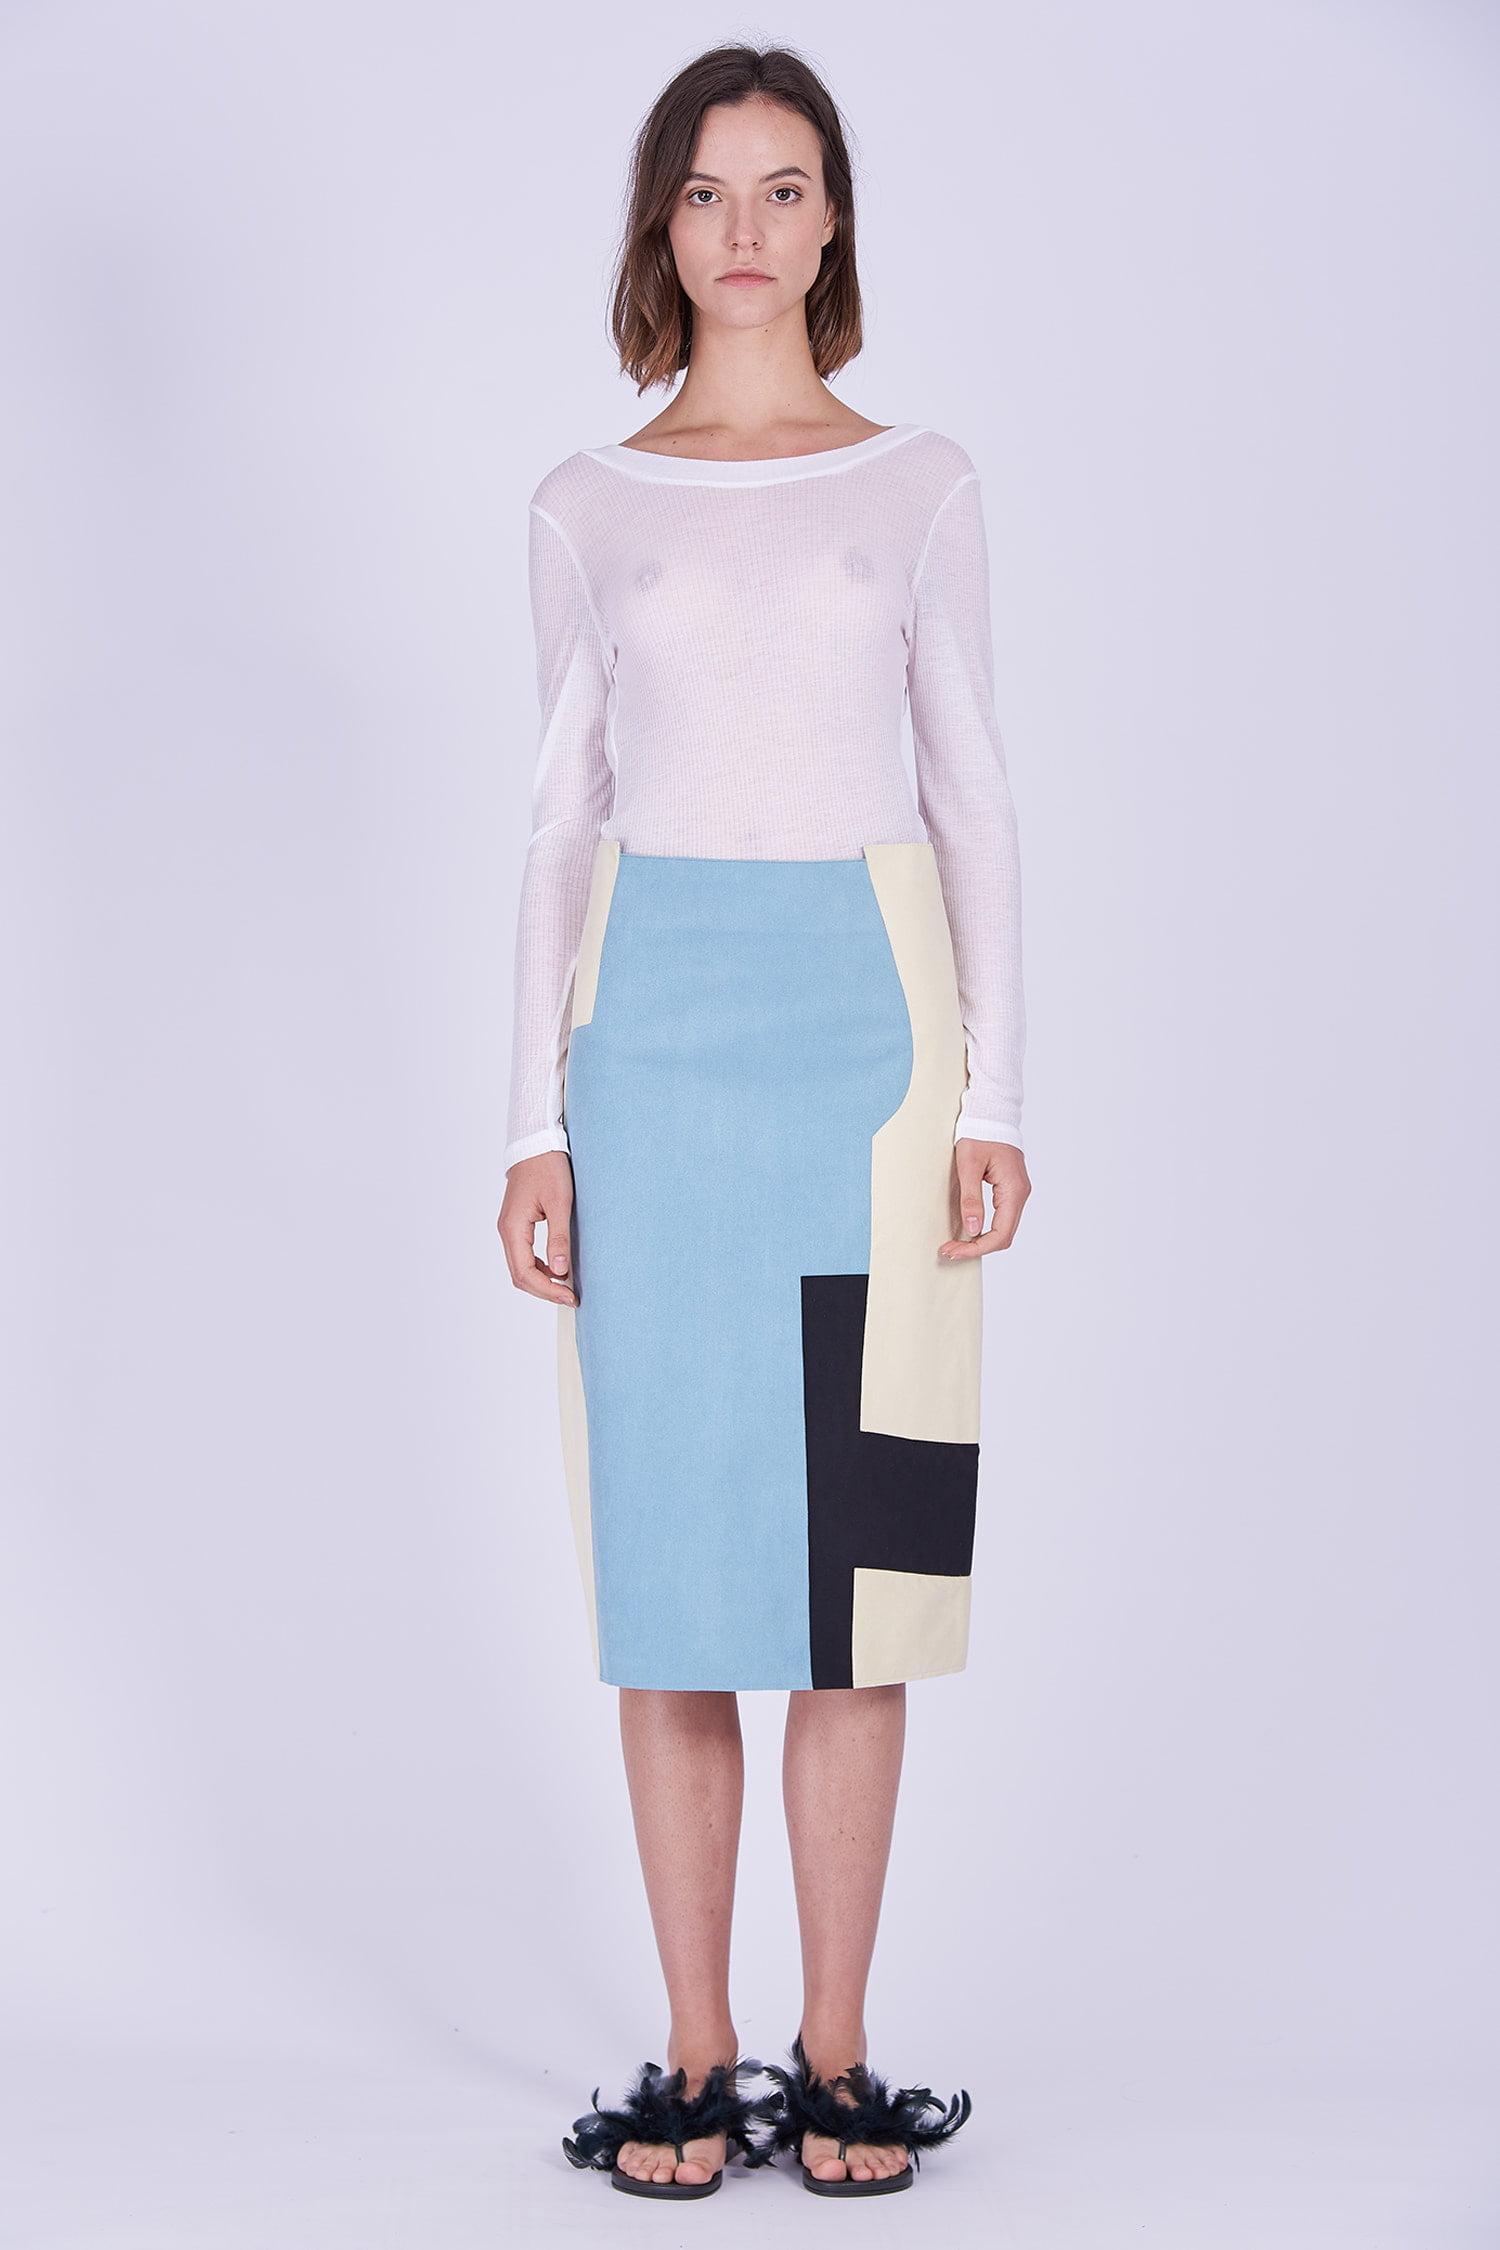 Acephala Ps2020 White Transparent Longsleeve Blue Creme Black Patchwork Skirt Bialy Spodnica Patchworkowa Front